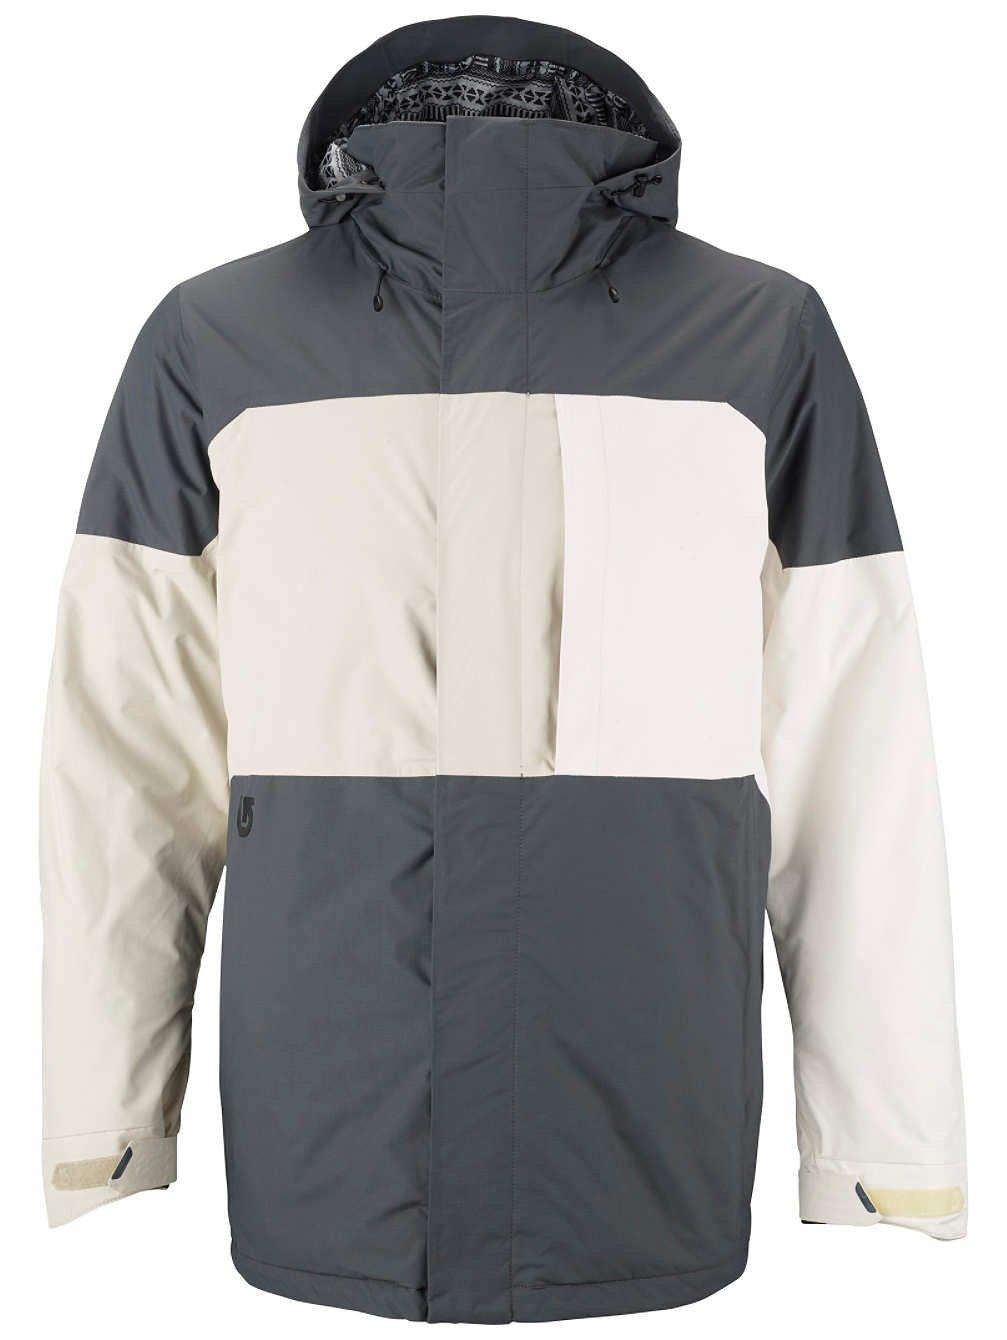 Burton Herren Snowboardjacke RA Land Line Jacket günstig bestellen